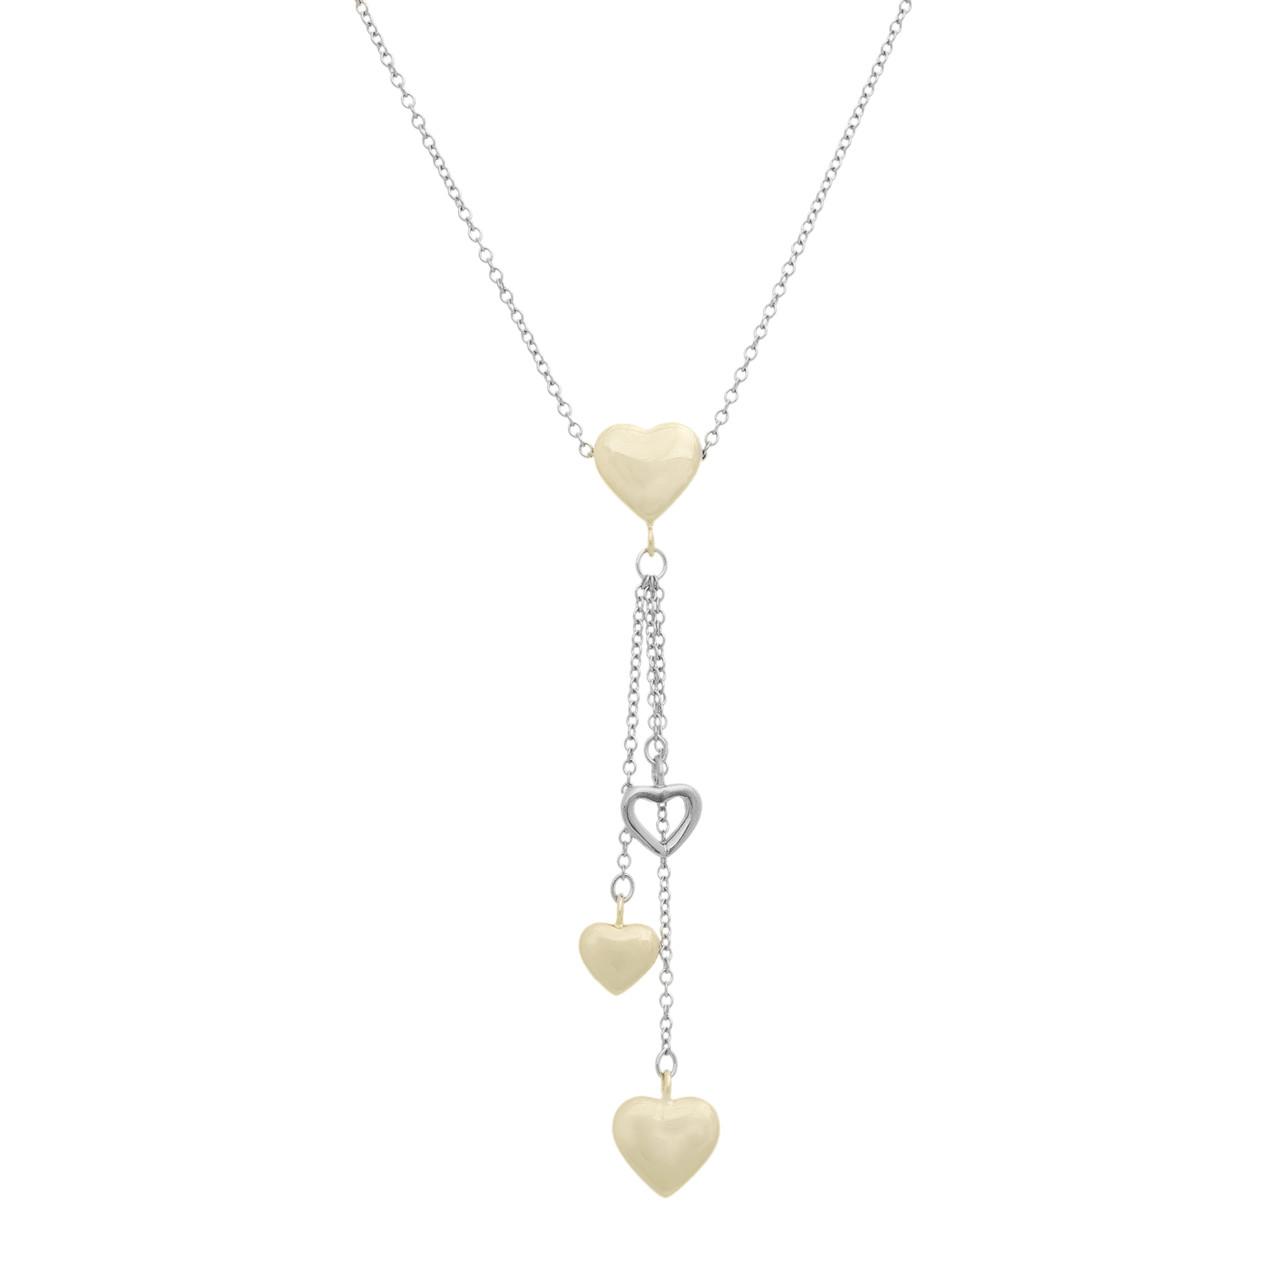 fadee42dc Tiffany & Co. Multi Heart Drop Pendant Necklace - modaselle